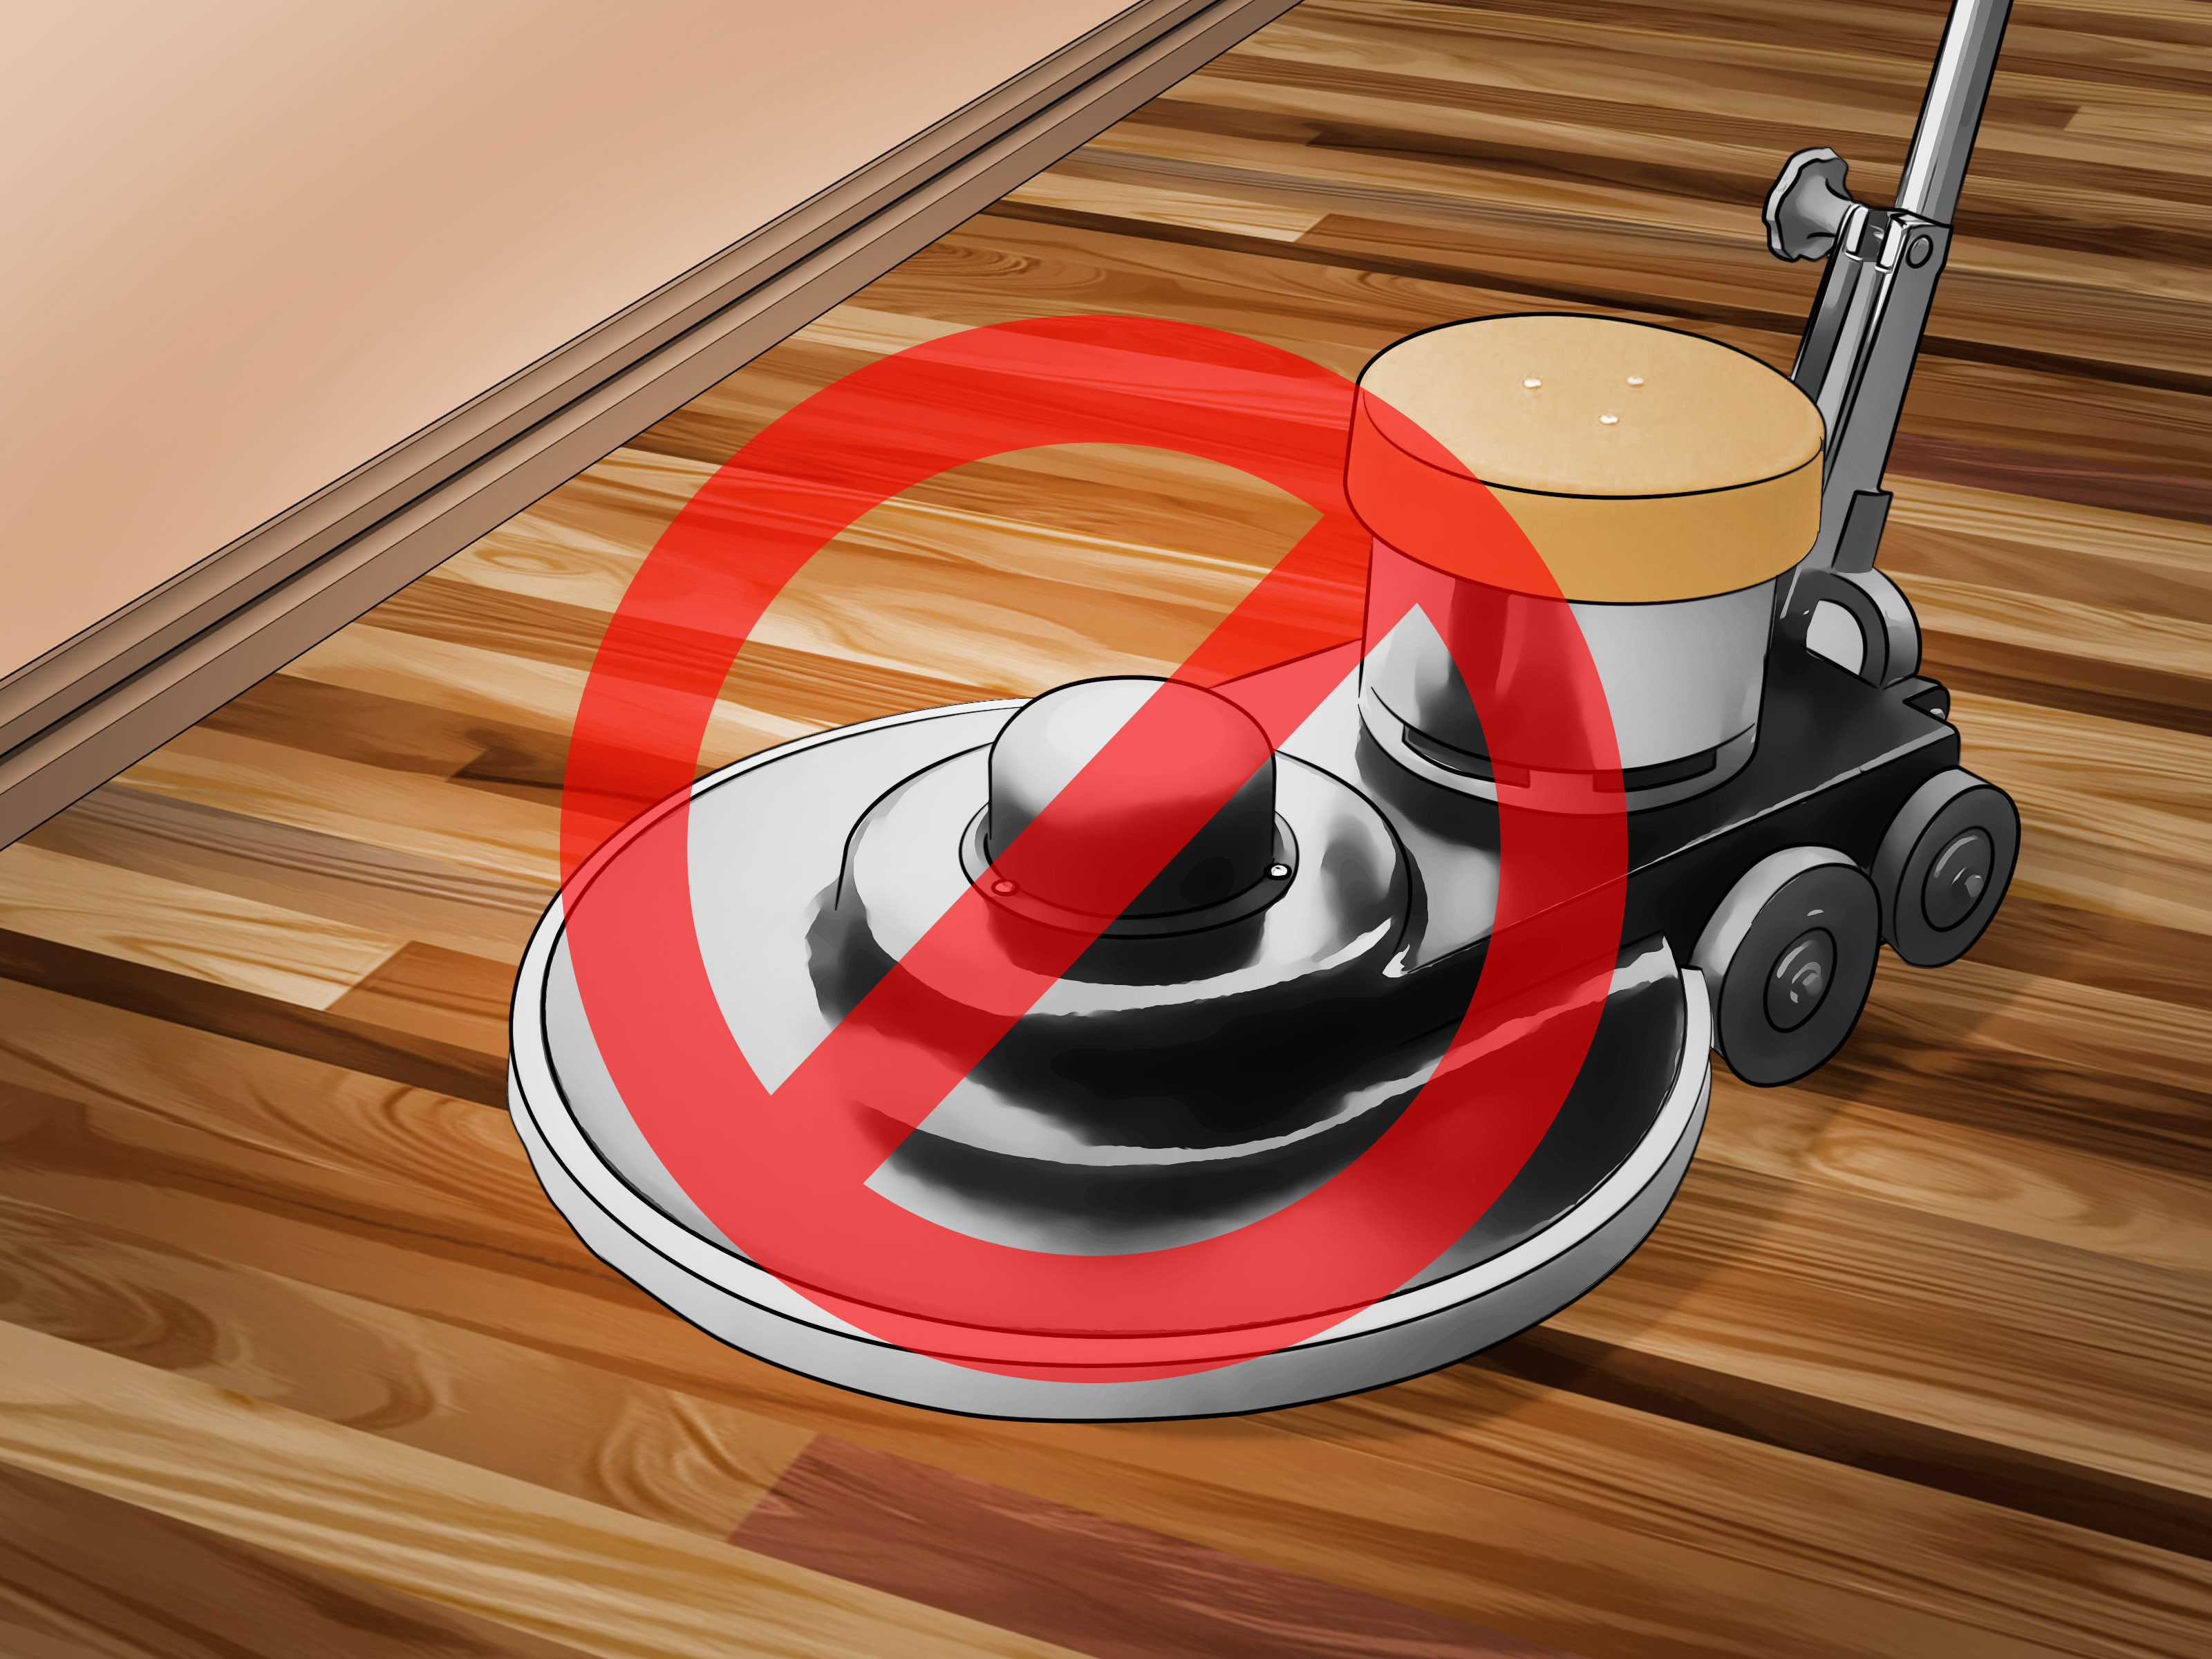 how long does it take to refinish hardwood floors of 4 ways to clean polyurethane wood floors wikihow in clean polyurethane wood floors step 15